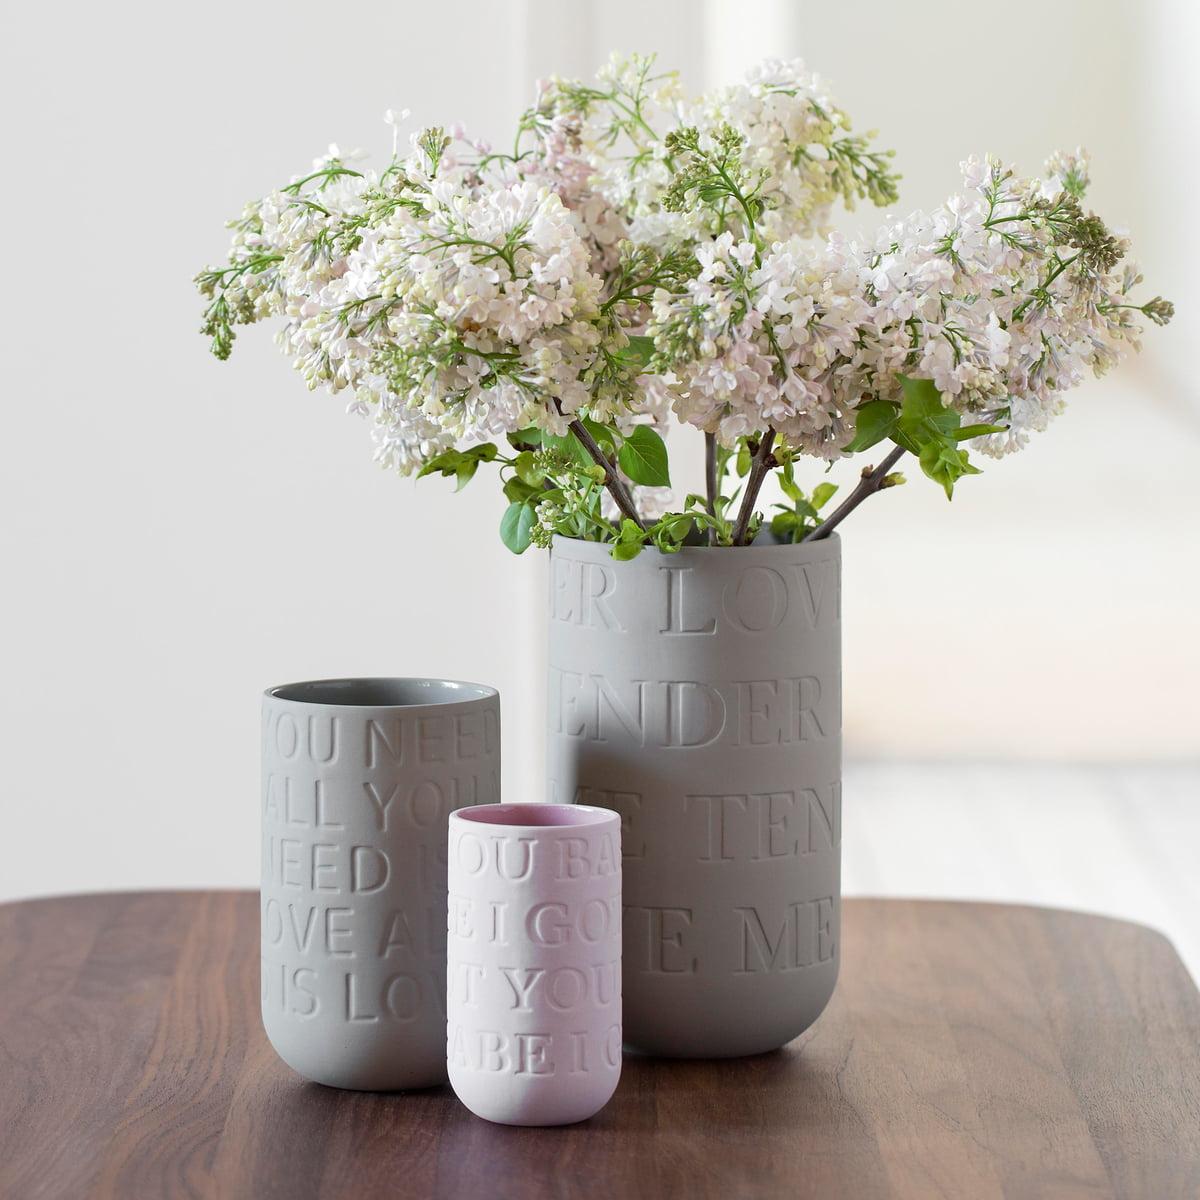 The khler design love song vase h 22 cm decorative vases with typography details reviewsmspy